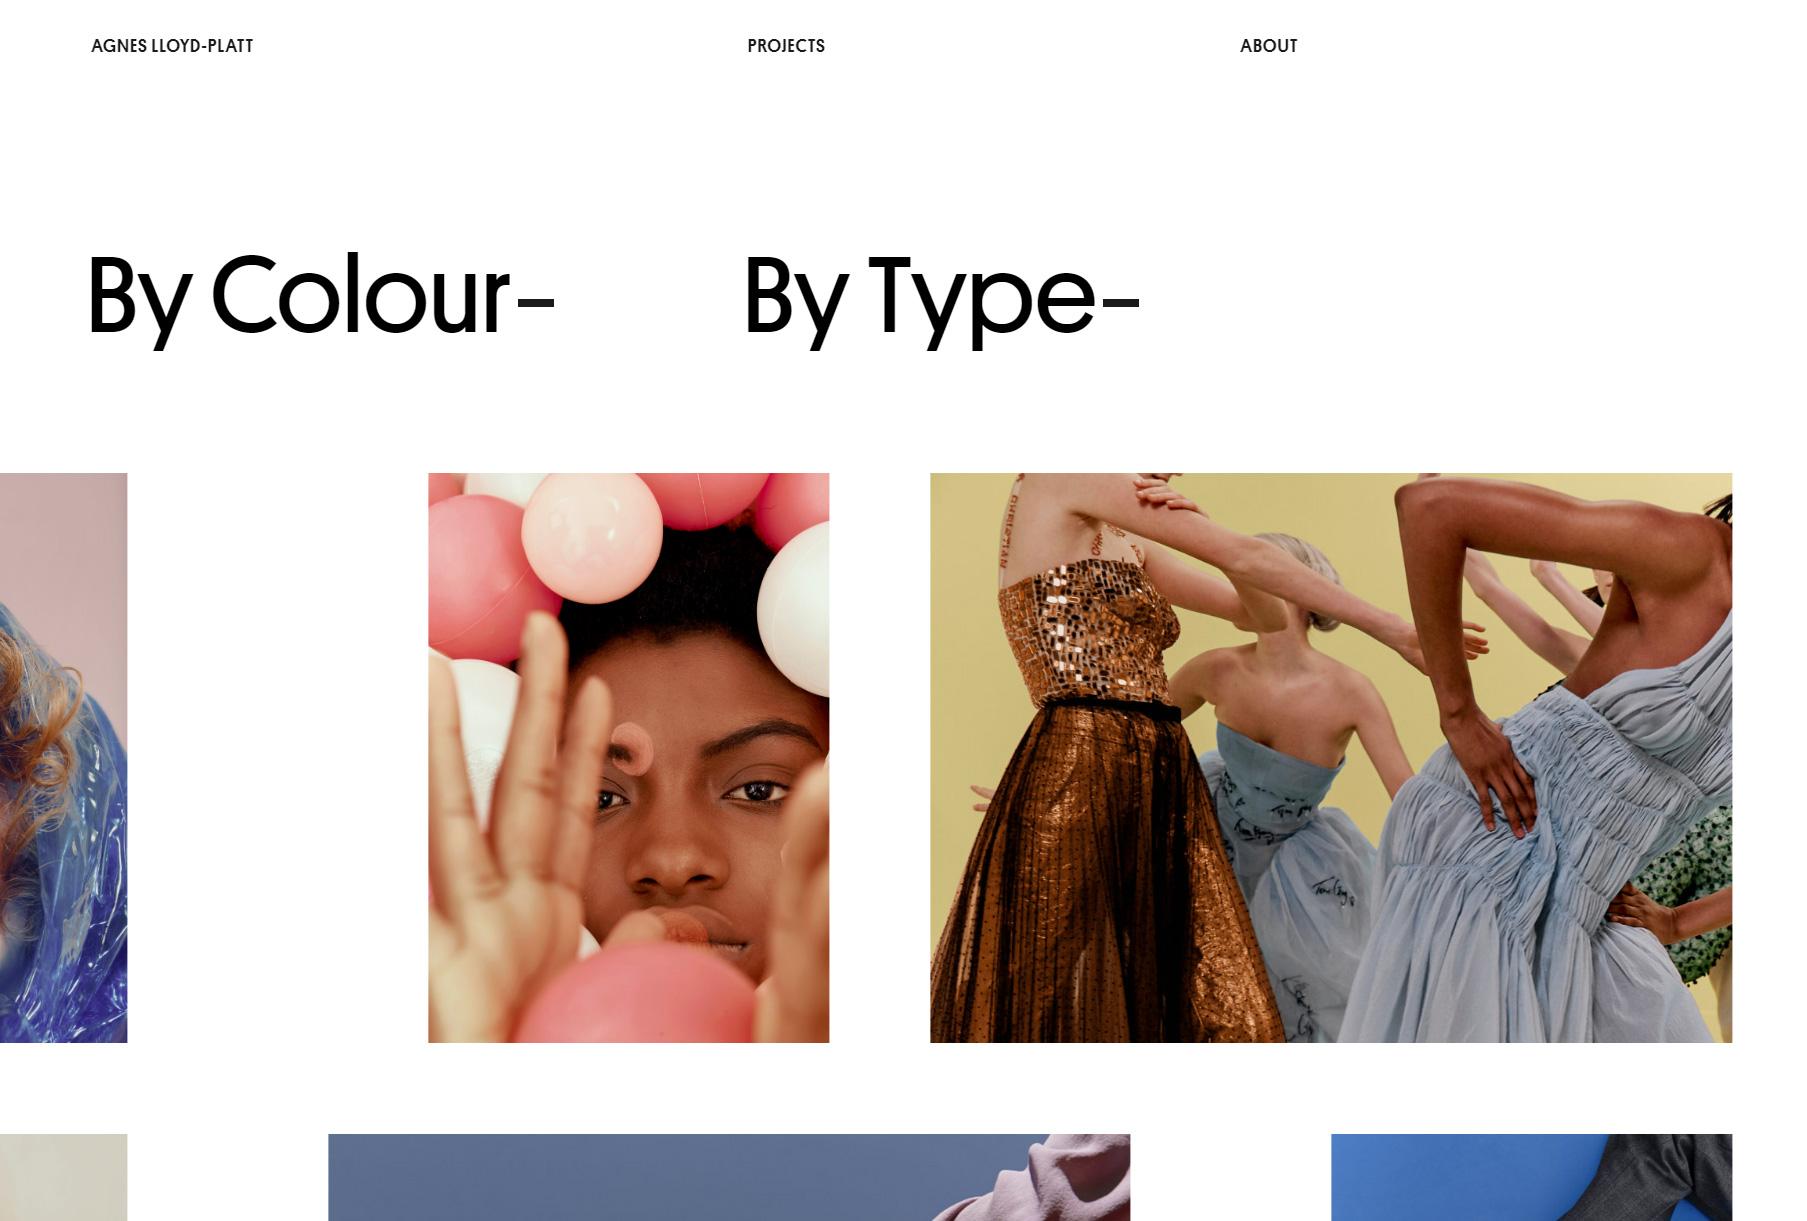 Agnes Lloyd-Platt - Website of the Day